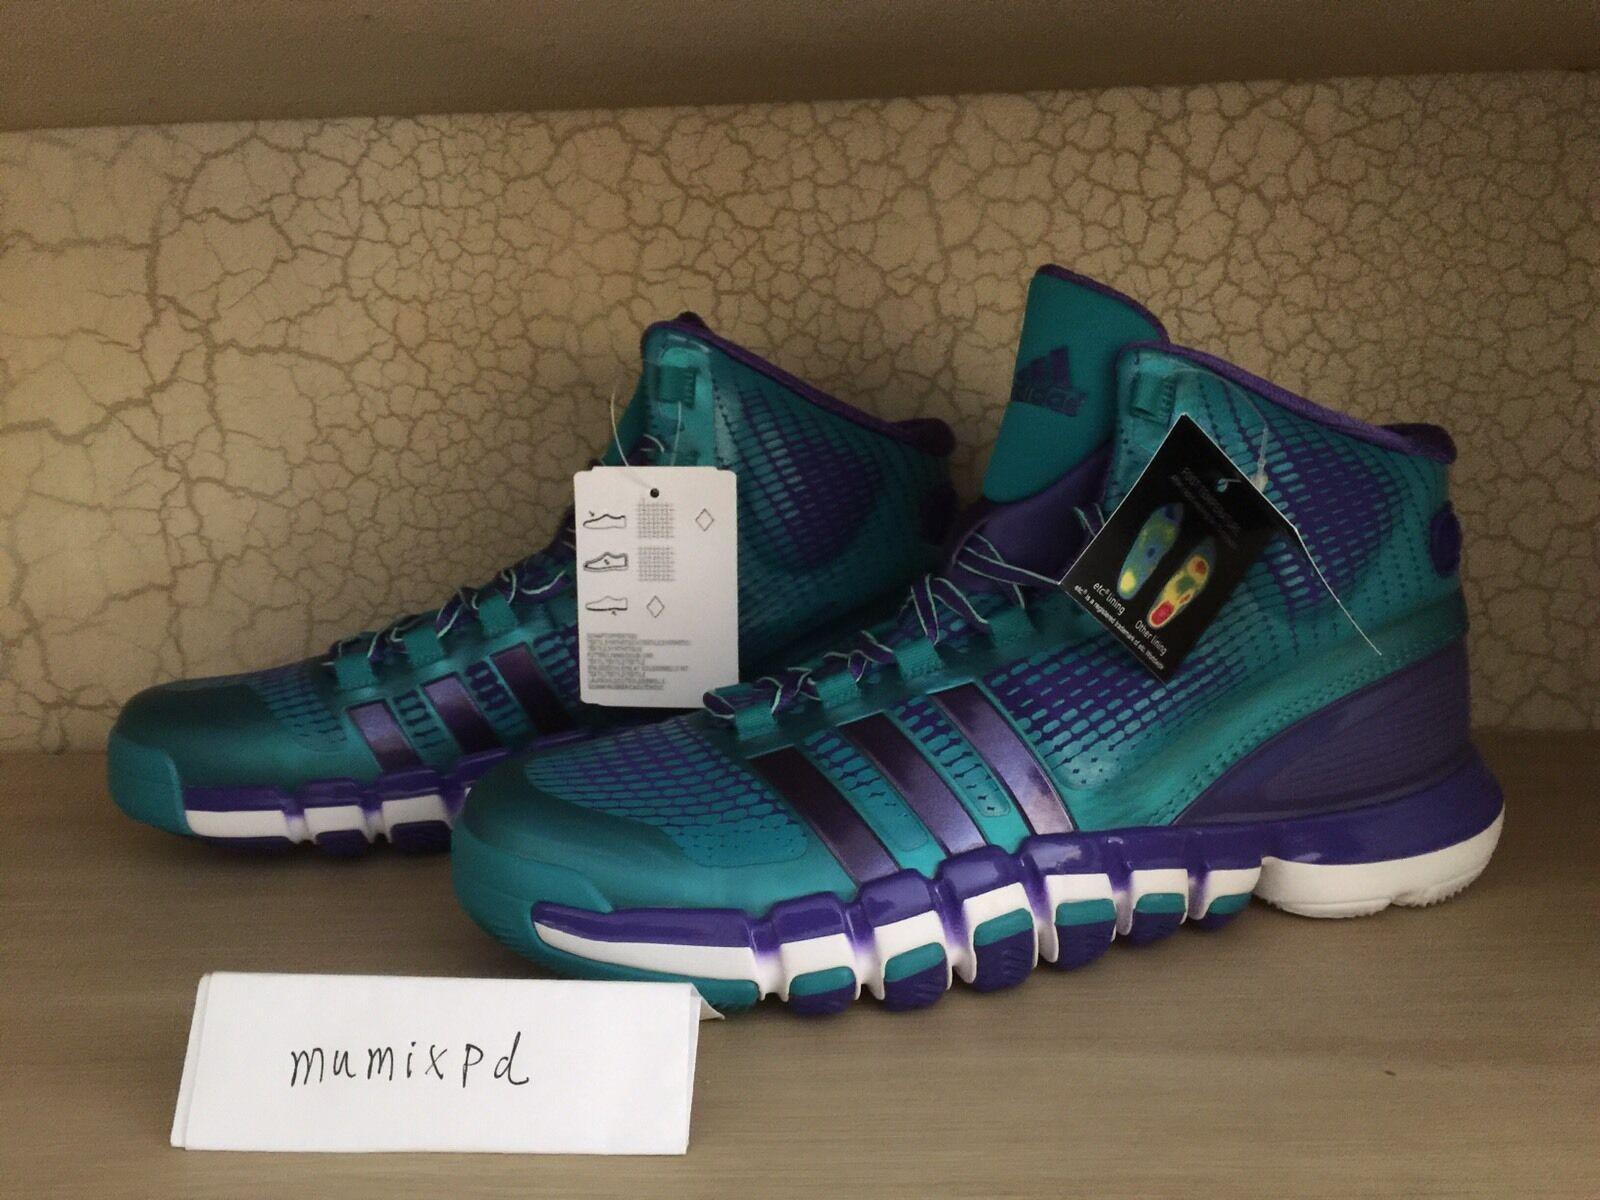 Men's adidas Crazyquick Basketball rare Q33304 wall dame 1 3 rose harden sz 9